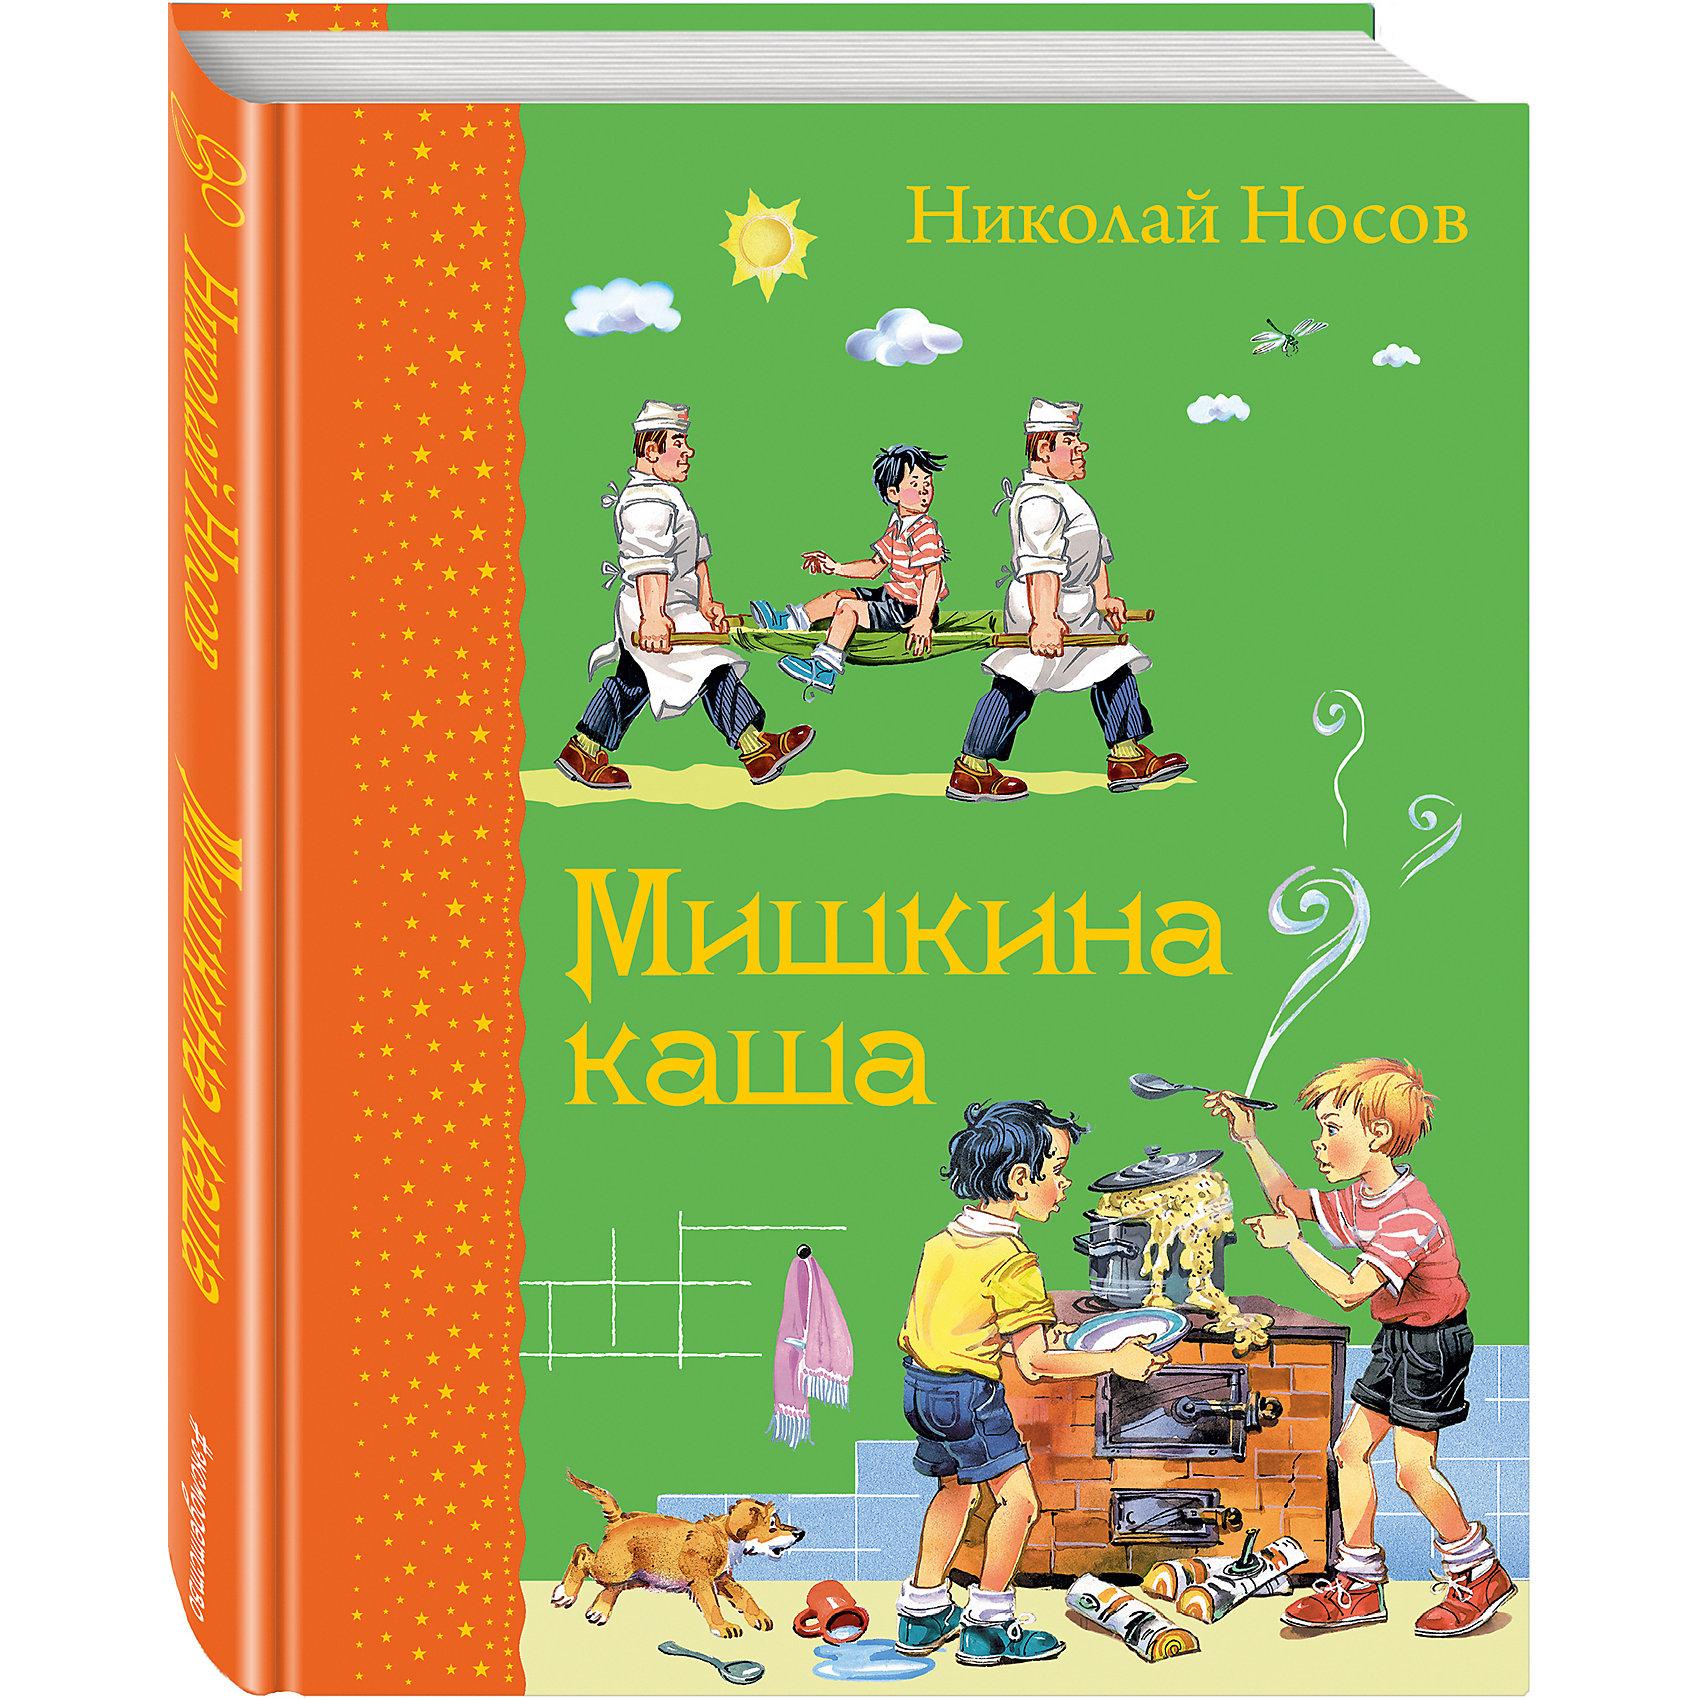 Эксмо Мишкина каша, Н. Носов сызранова в е ред me to you мишкина книжка